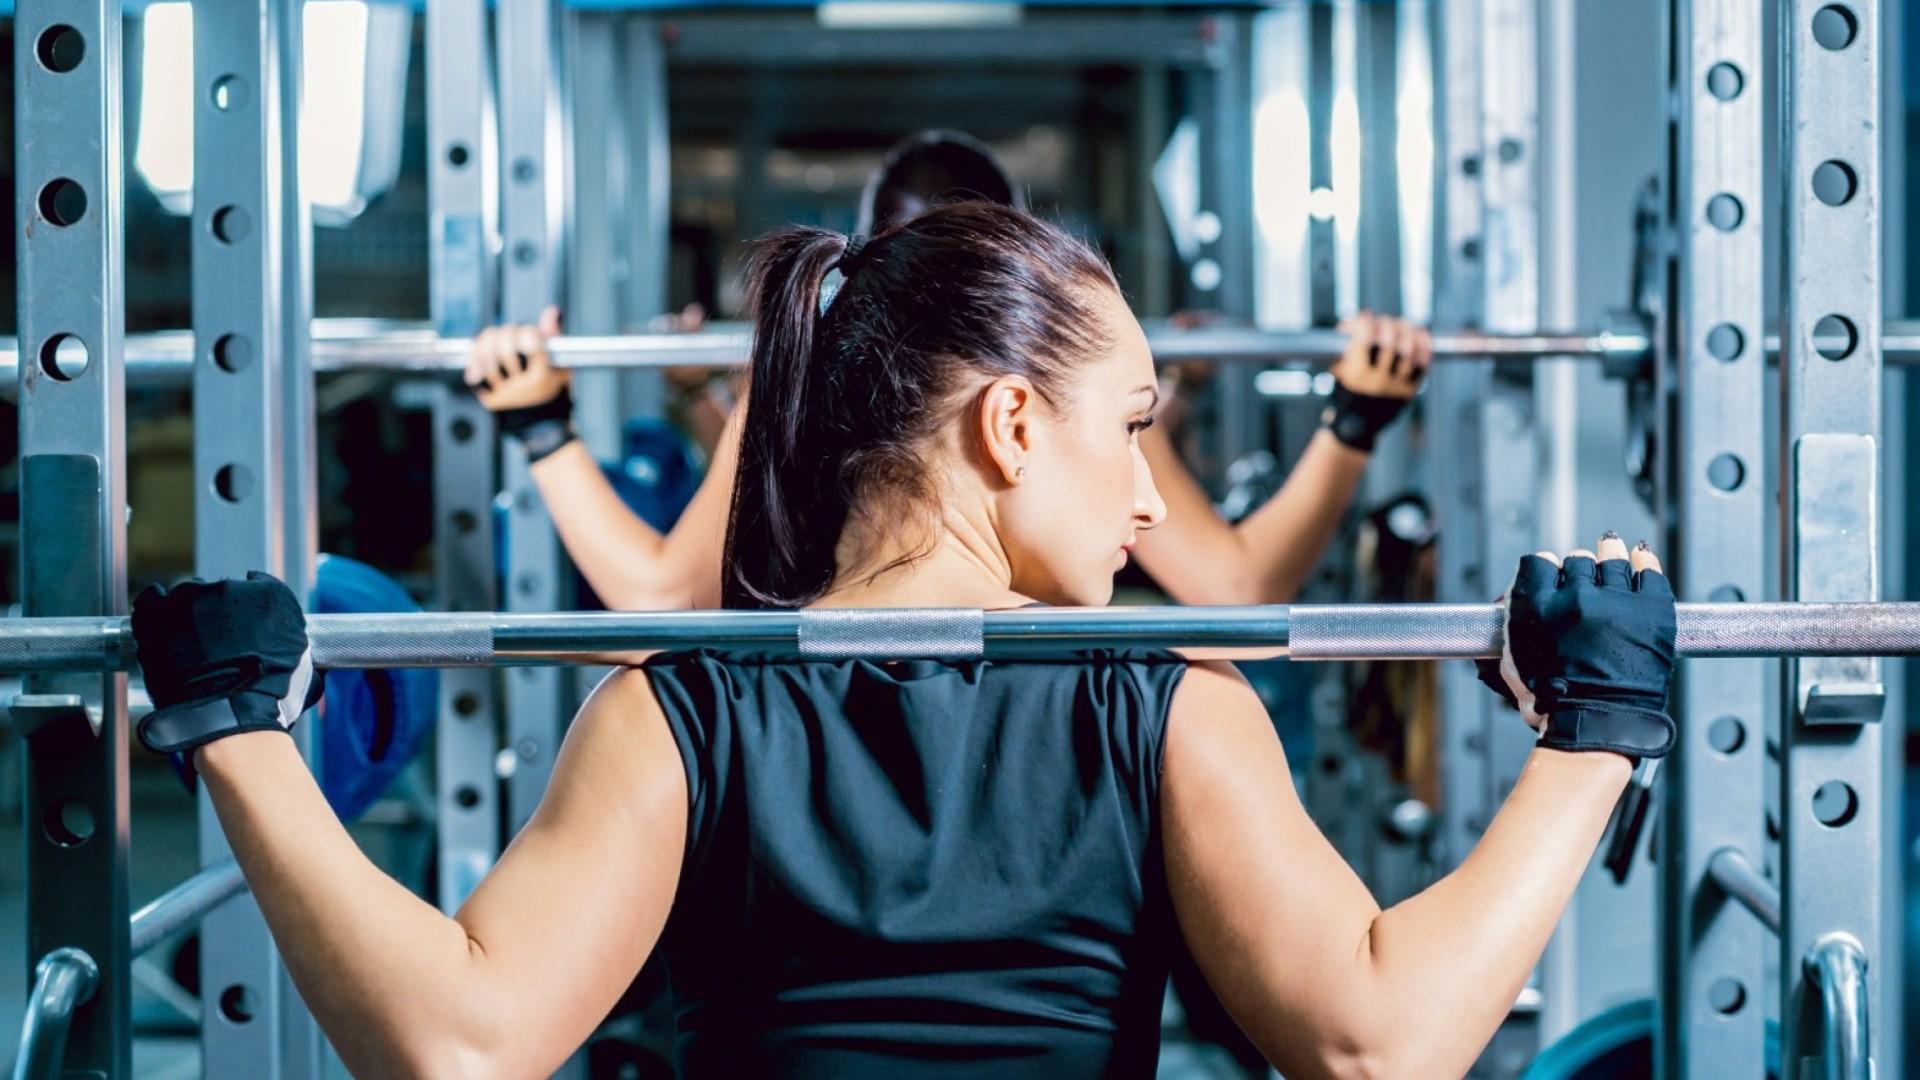 Fitness background image